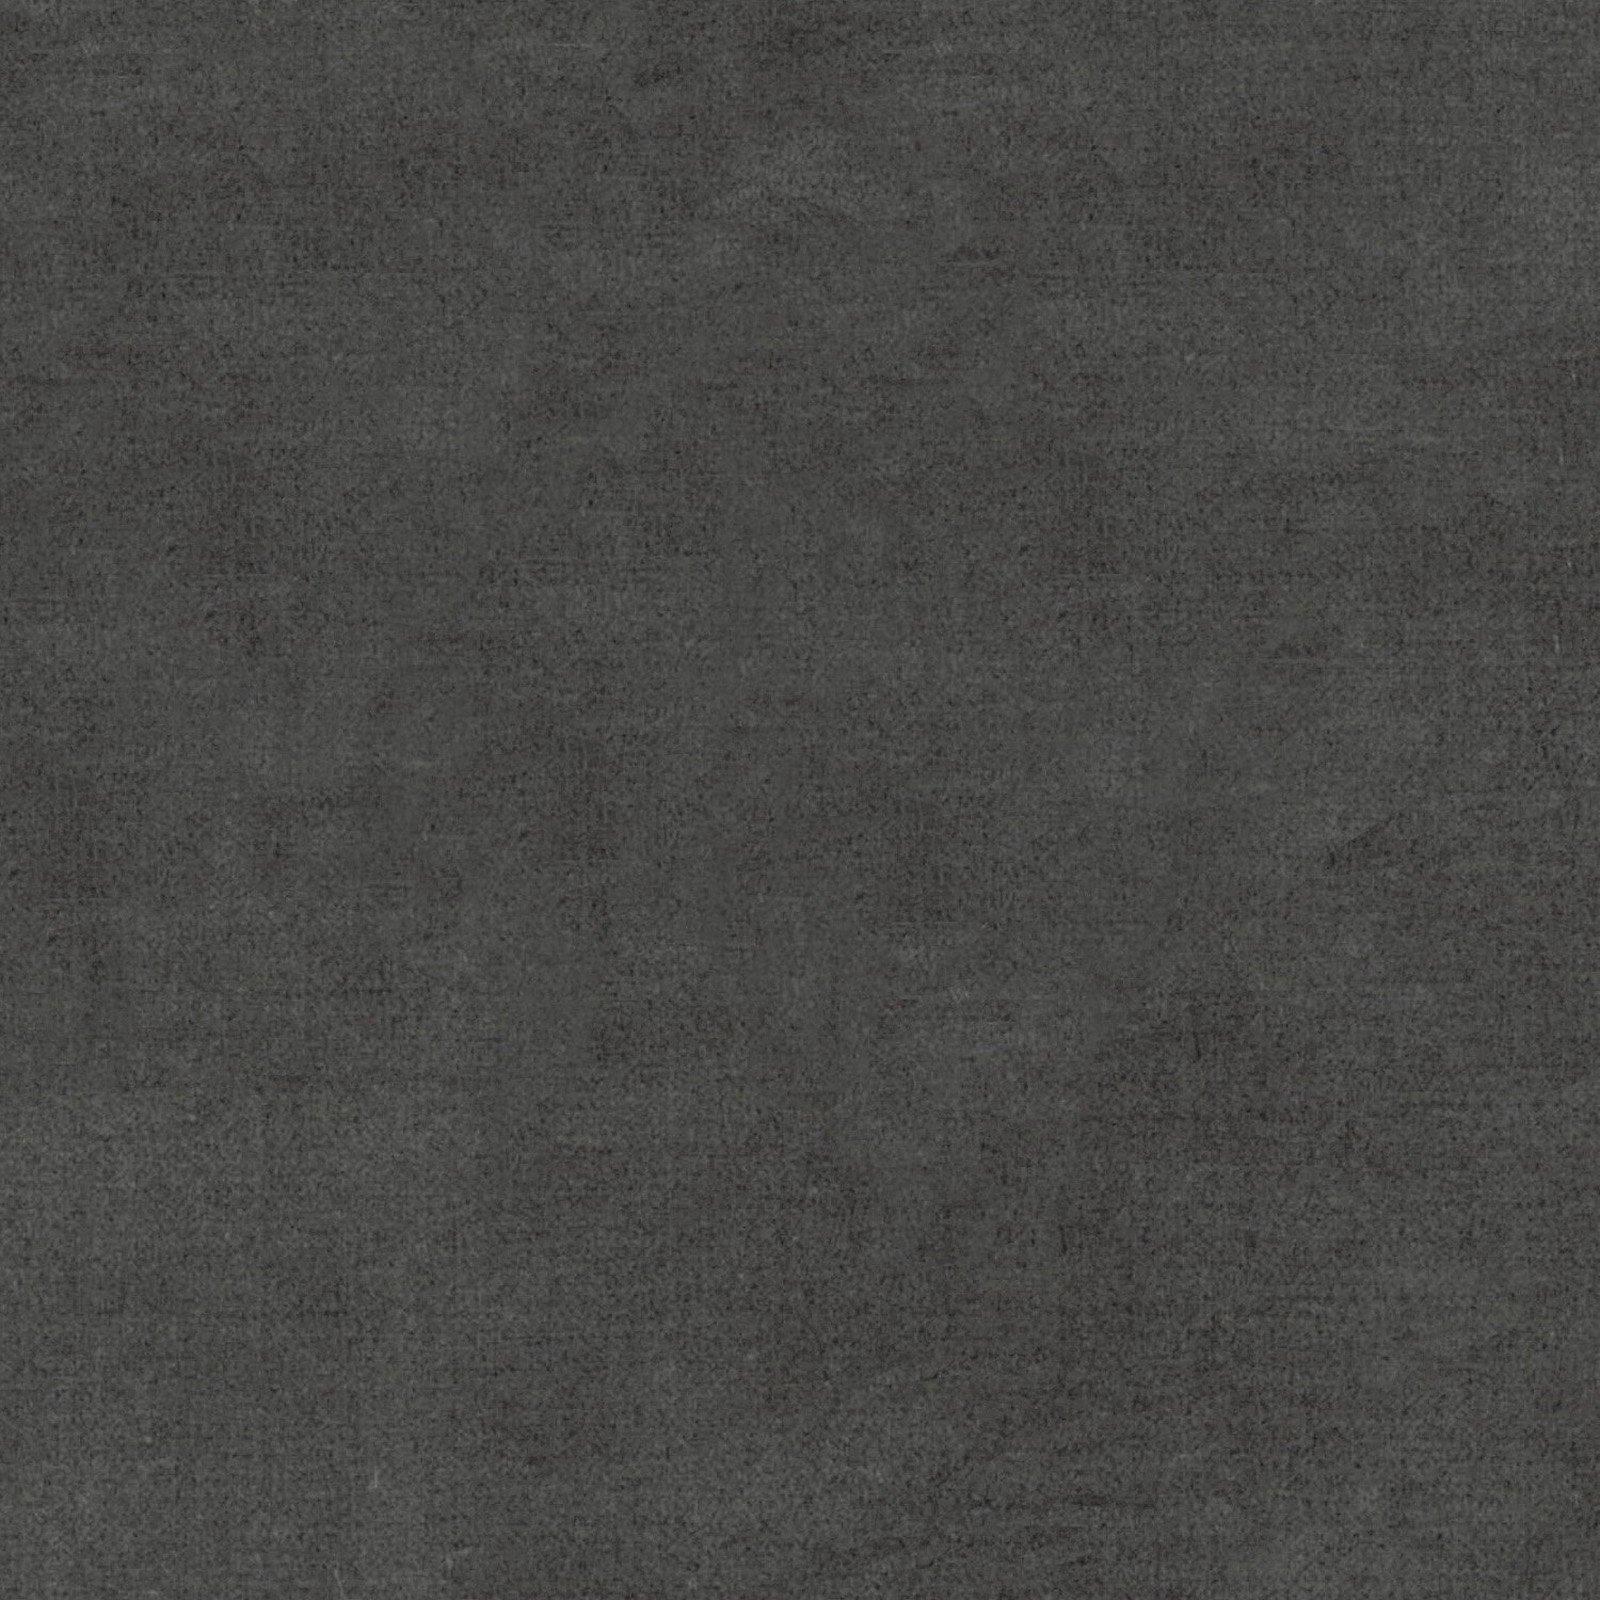 Blazing Needles Vitality 10 in. Full Size Microsuede Innerspring Premium Futon Mattress